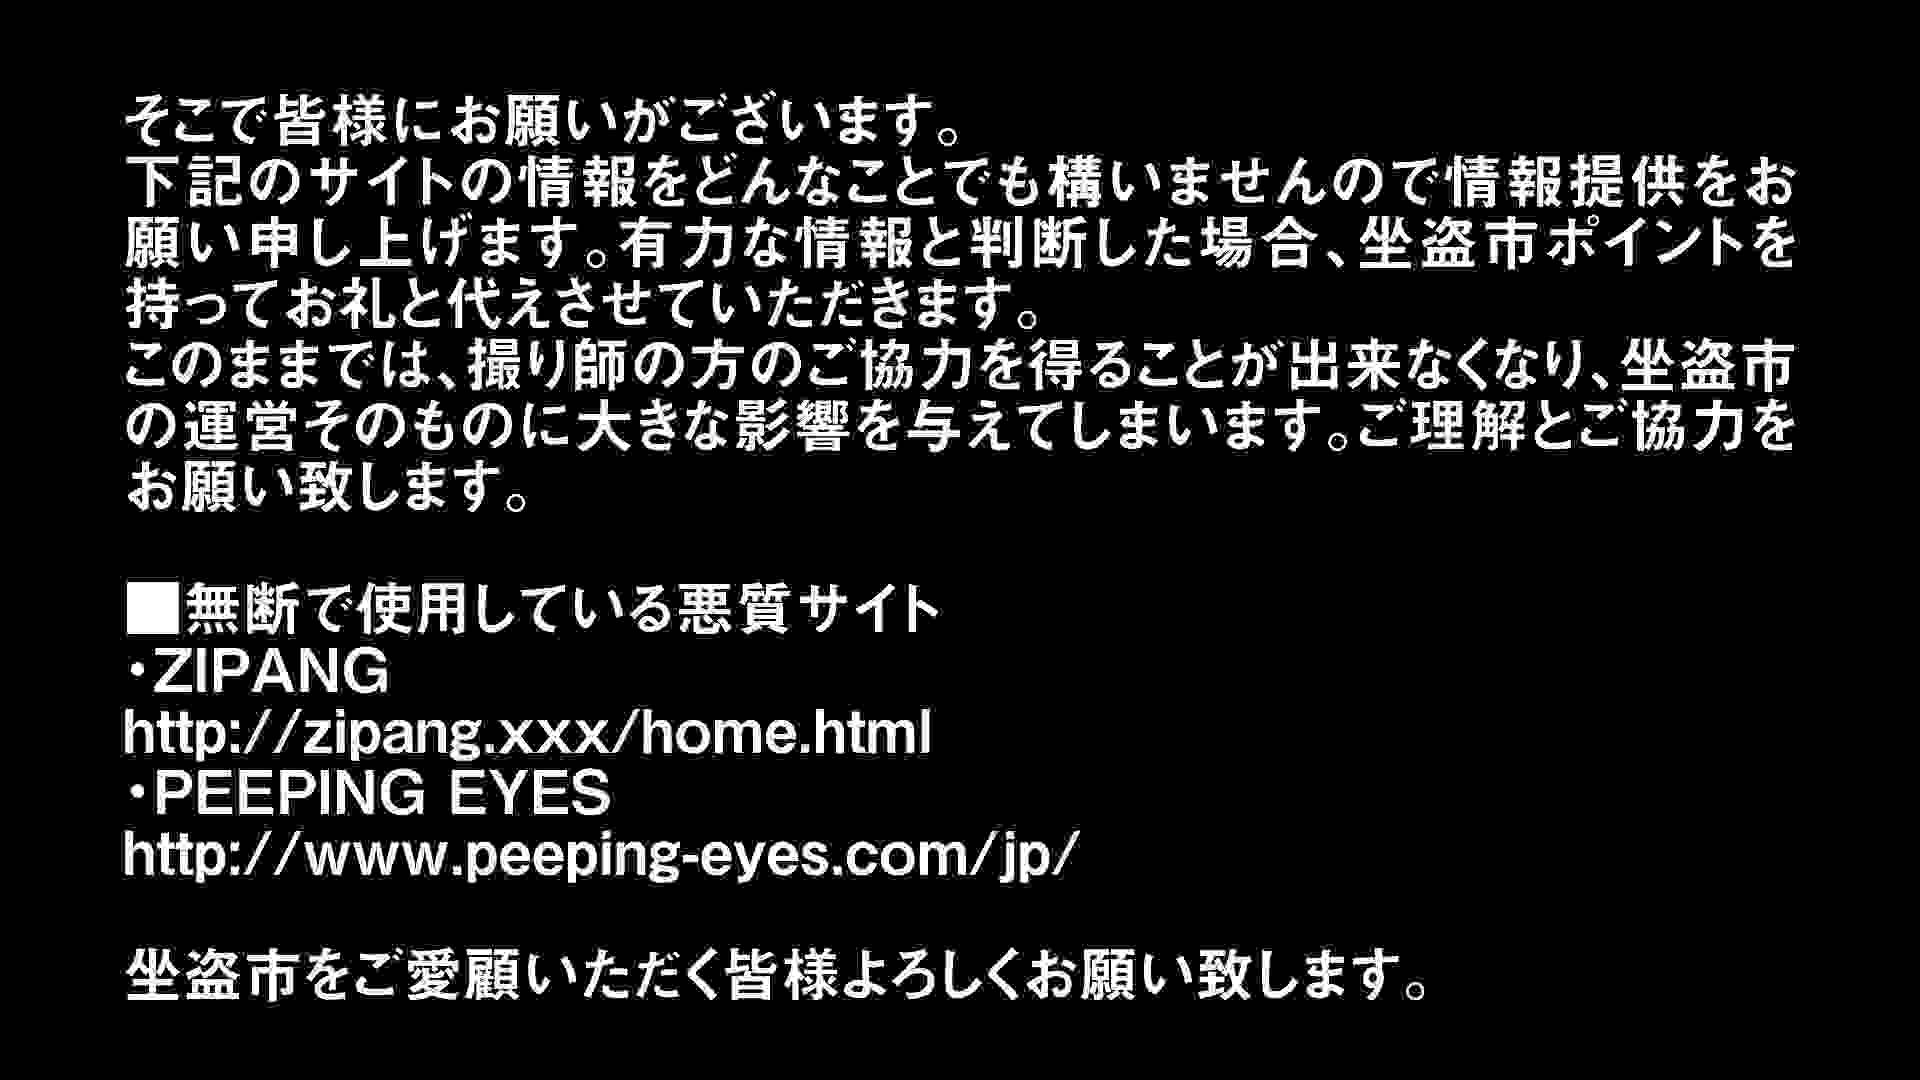 Aquaな露天風呂Vol.299 盗撮シリーズ | 露天風呂編  82PIX 27